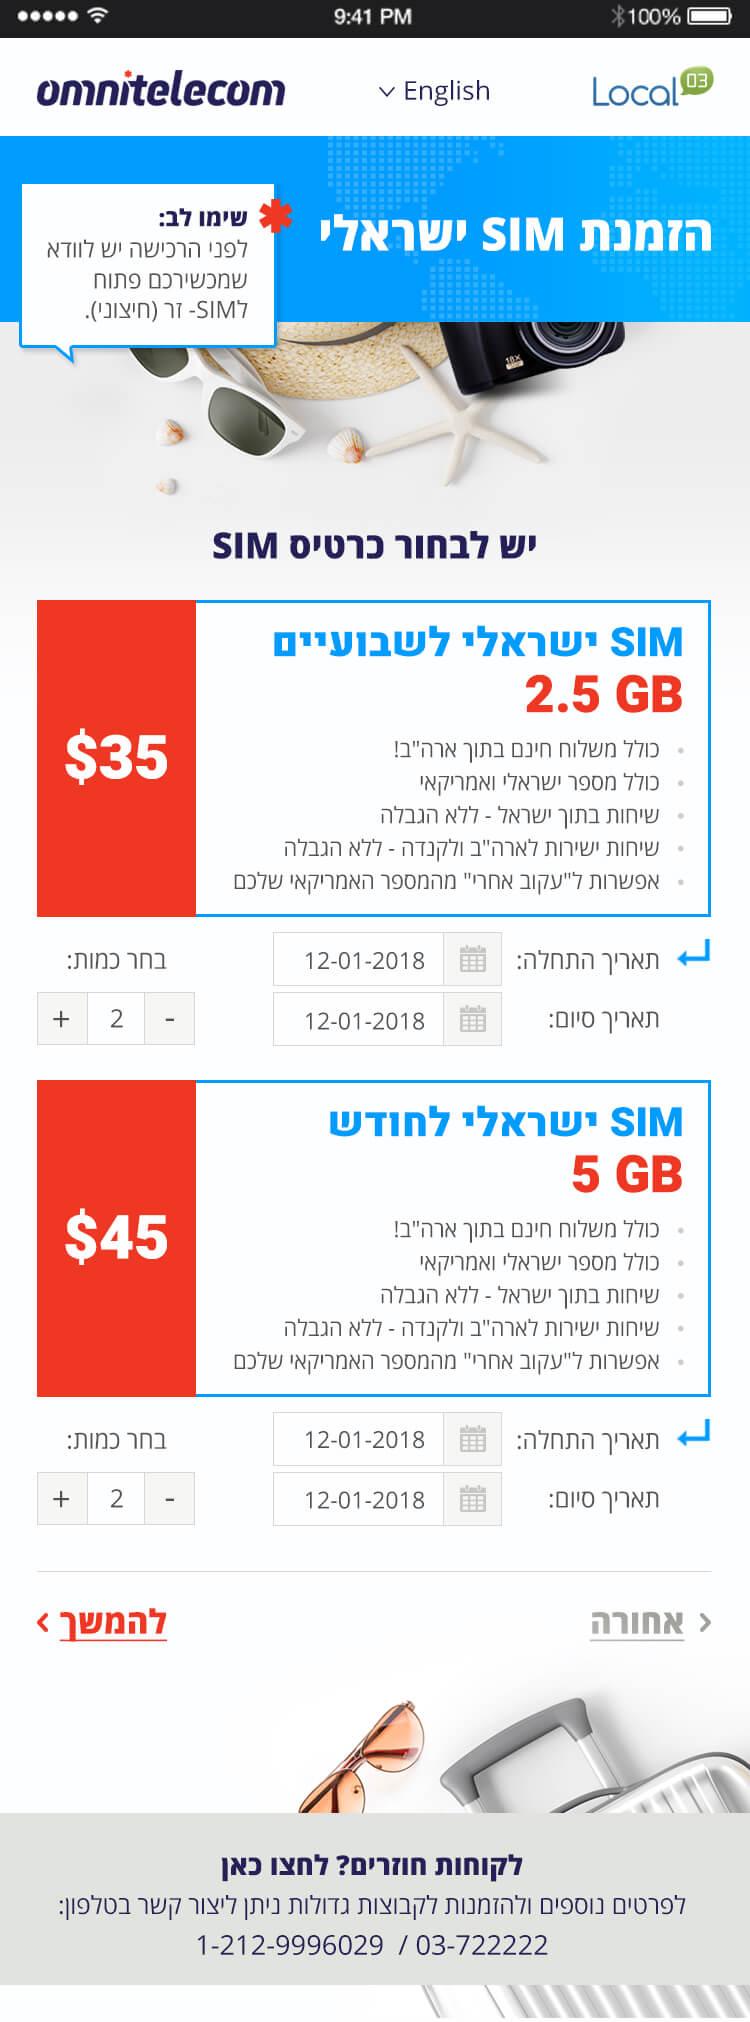 Progressive Web App for Telecommunications service provider in Ramat Gan